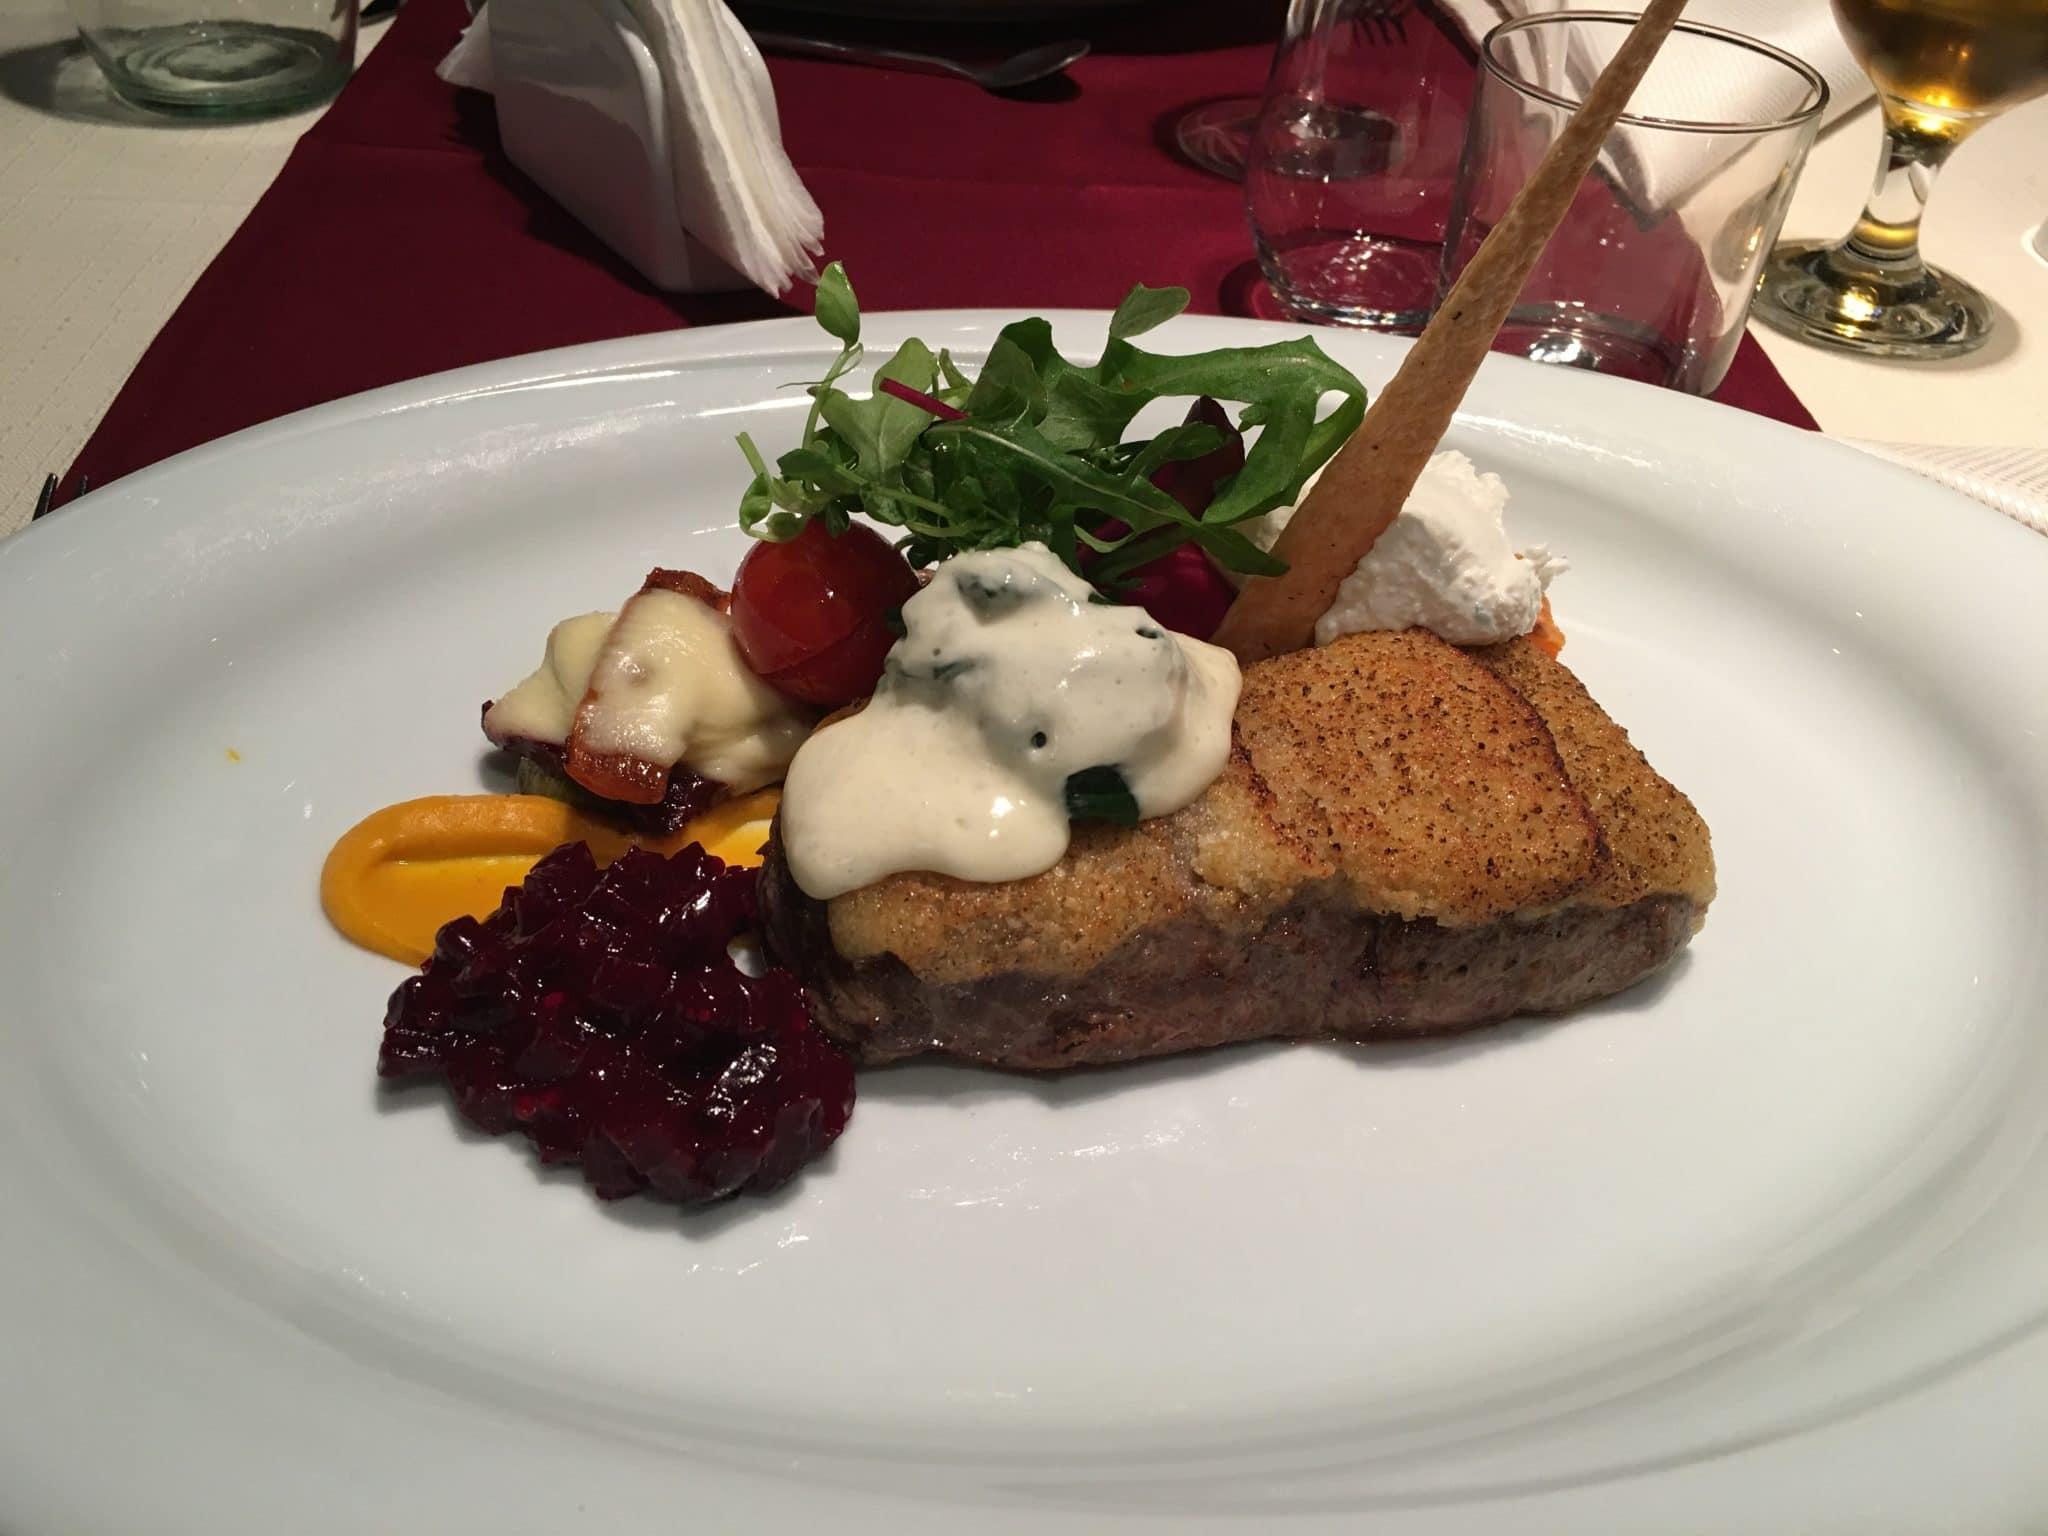 Vita cu parmezan la restaurant Belvedere Brasov